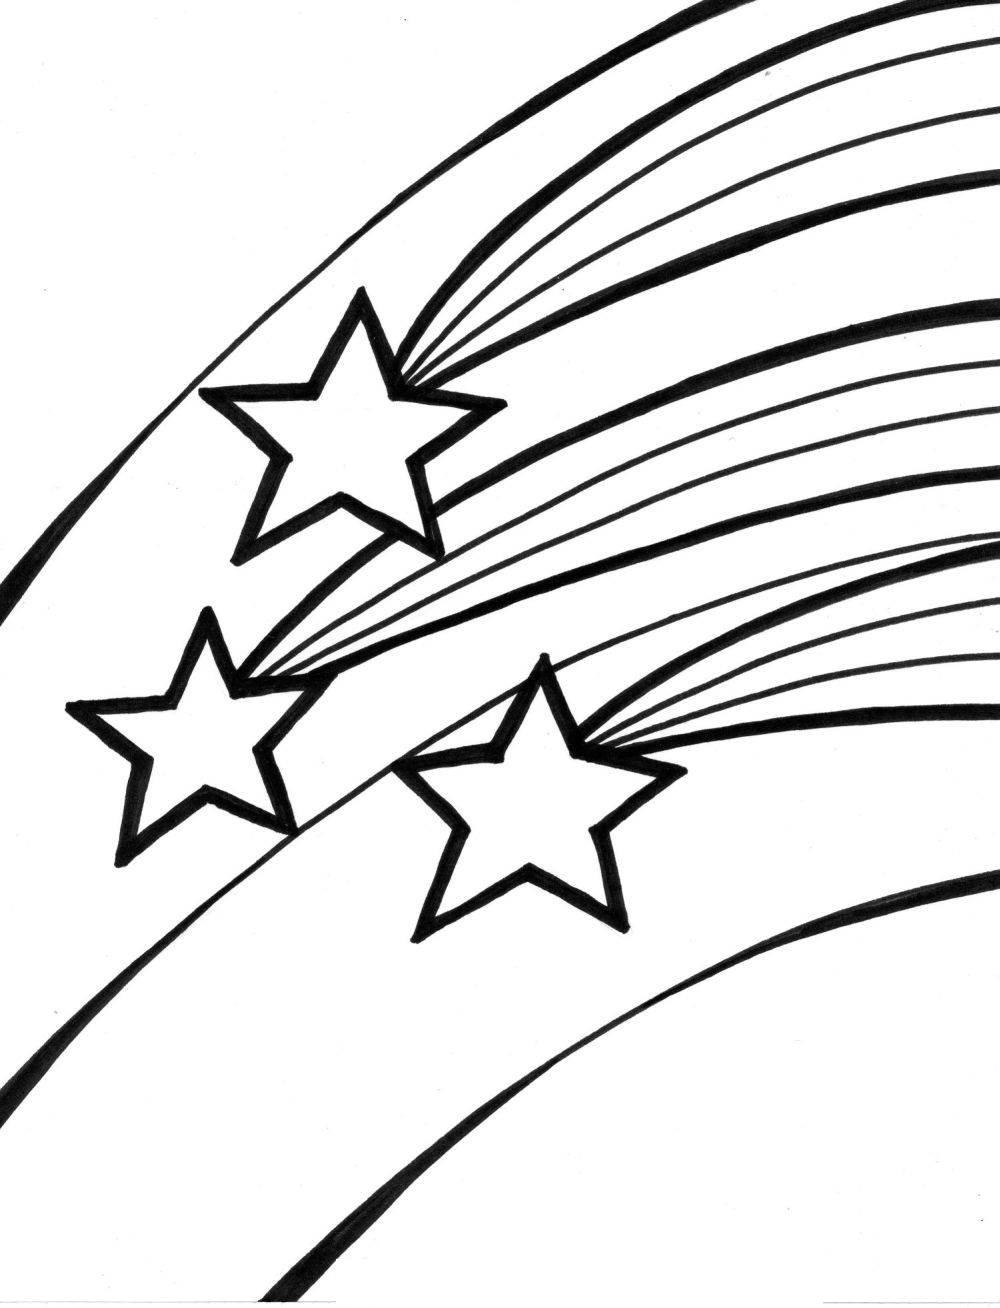 star picture to color dibujos para colorear dibujos de estrellas para colorear picture star to color